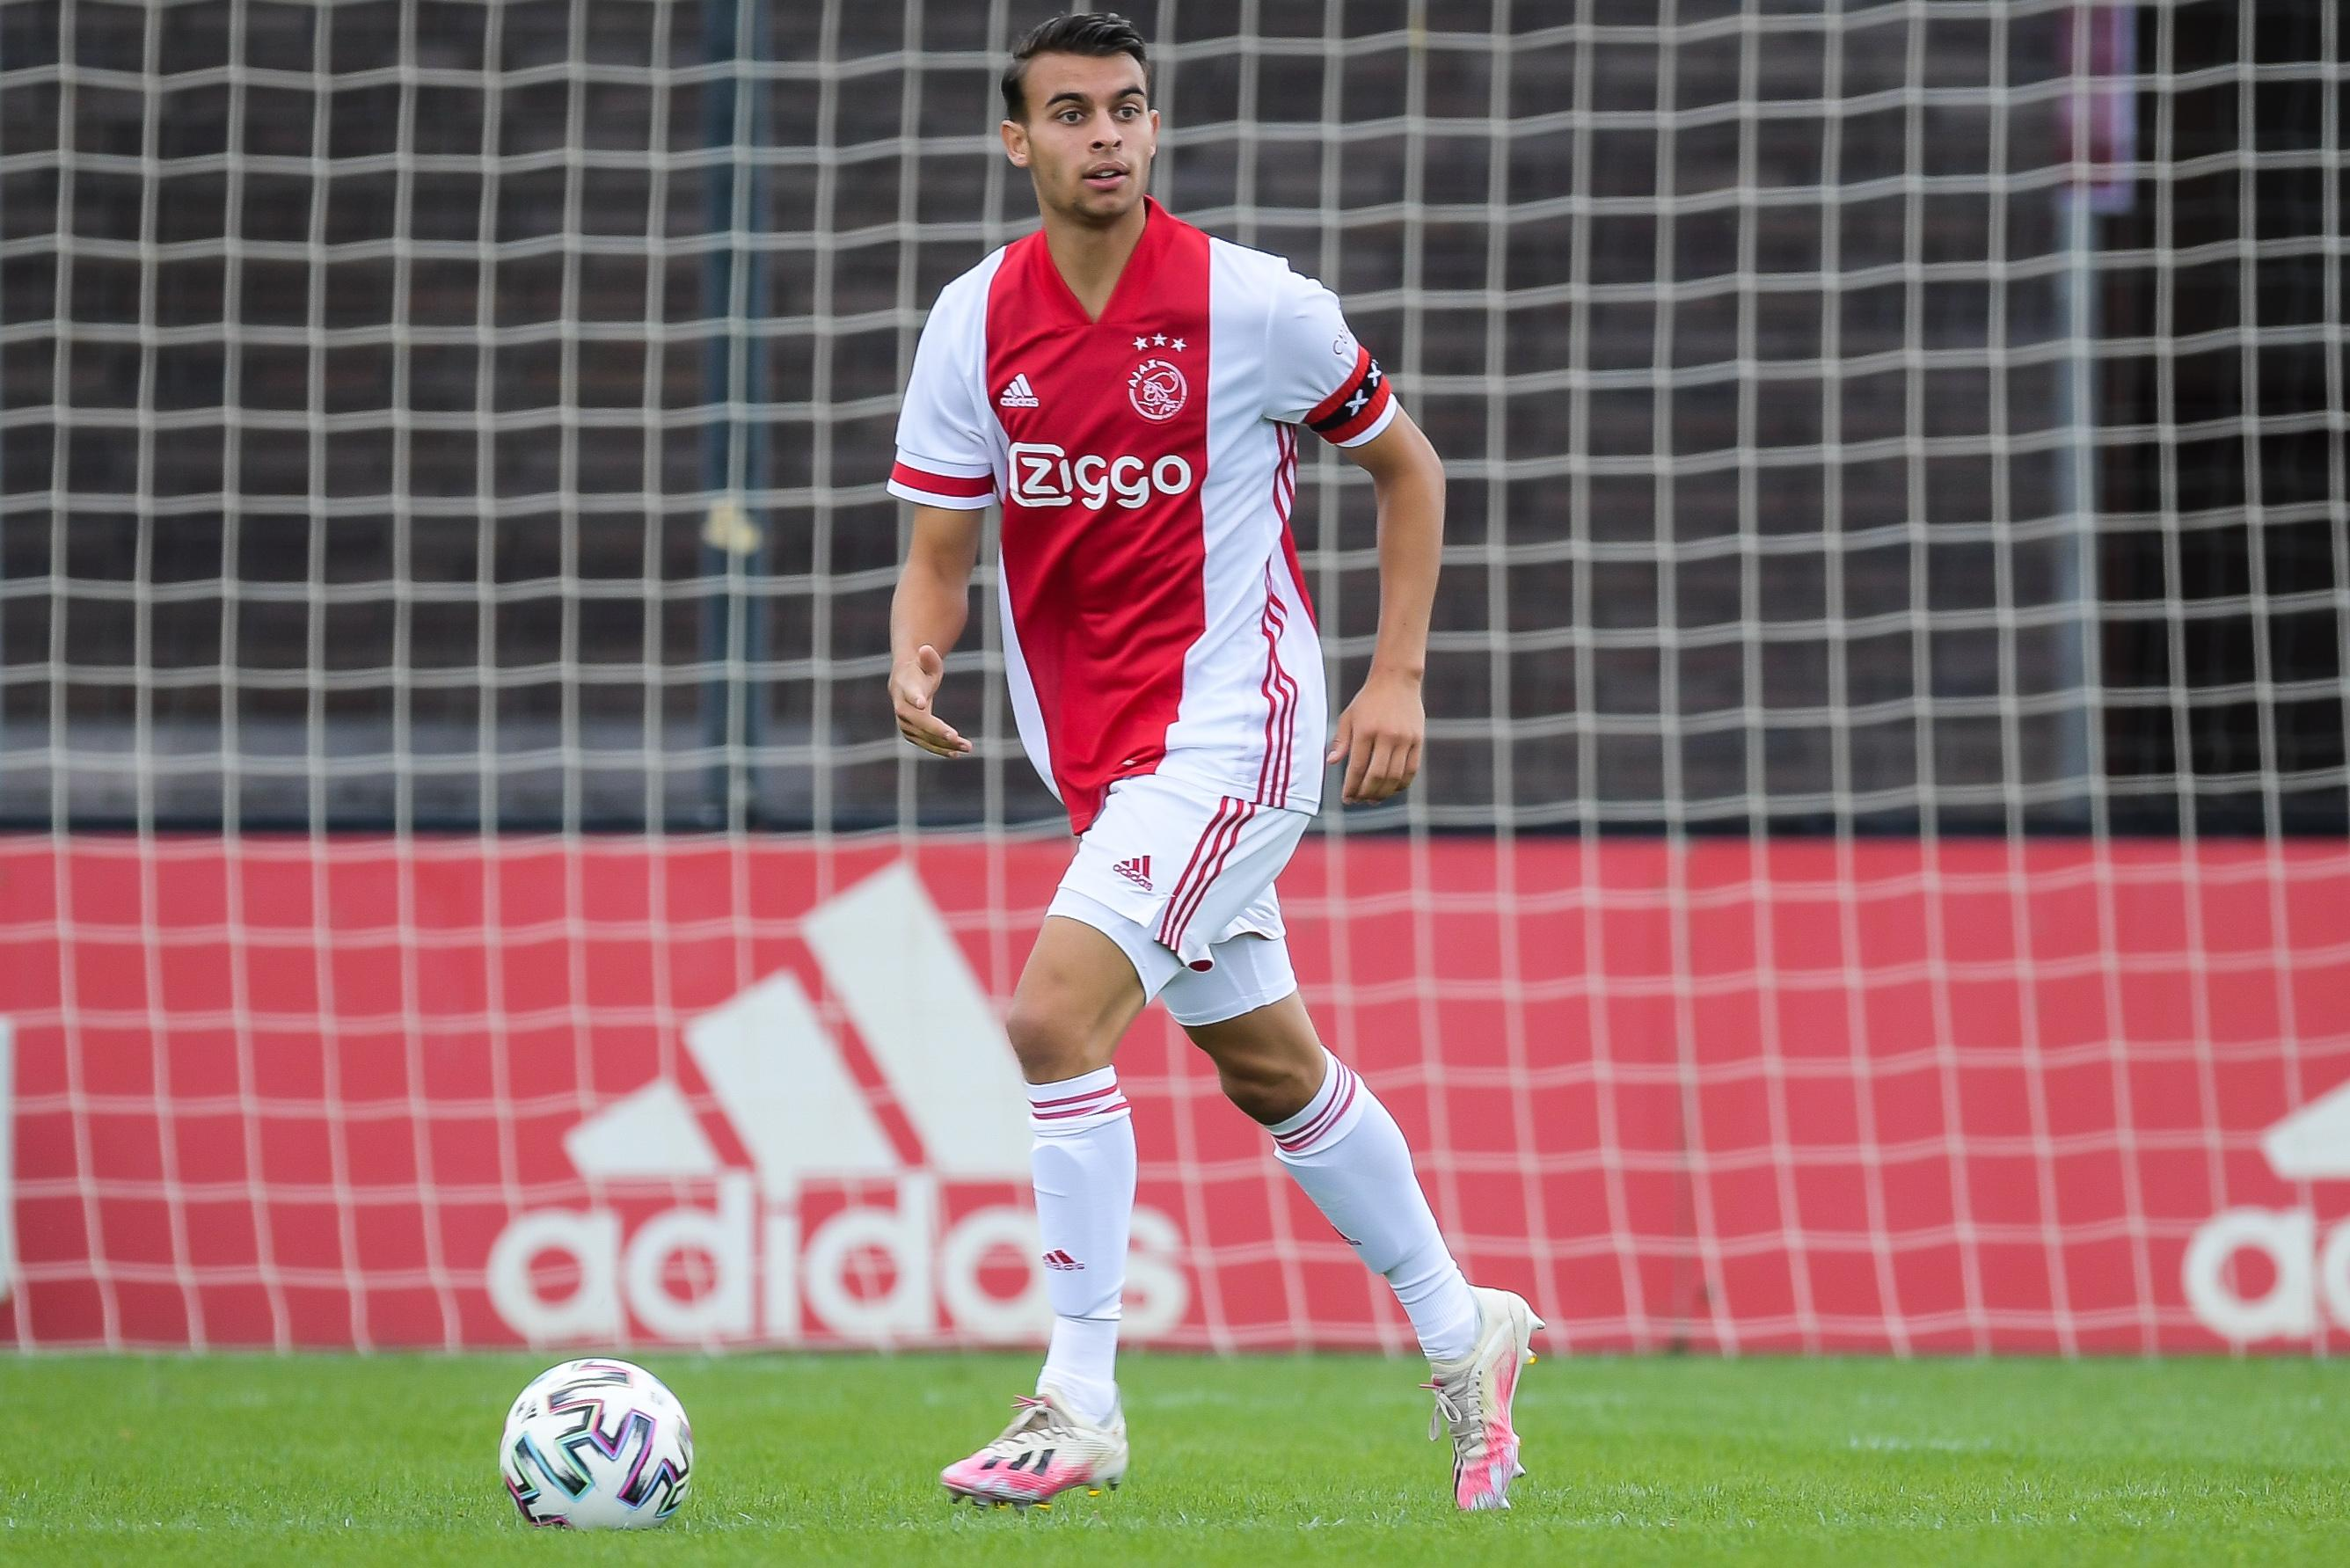 Purmerender met Spaans temperament Enric Llansana streeft Champions League-niveau na: opgevoed mét en door Ajax [video]